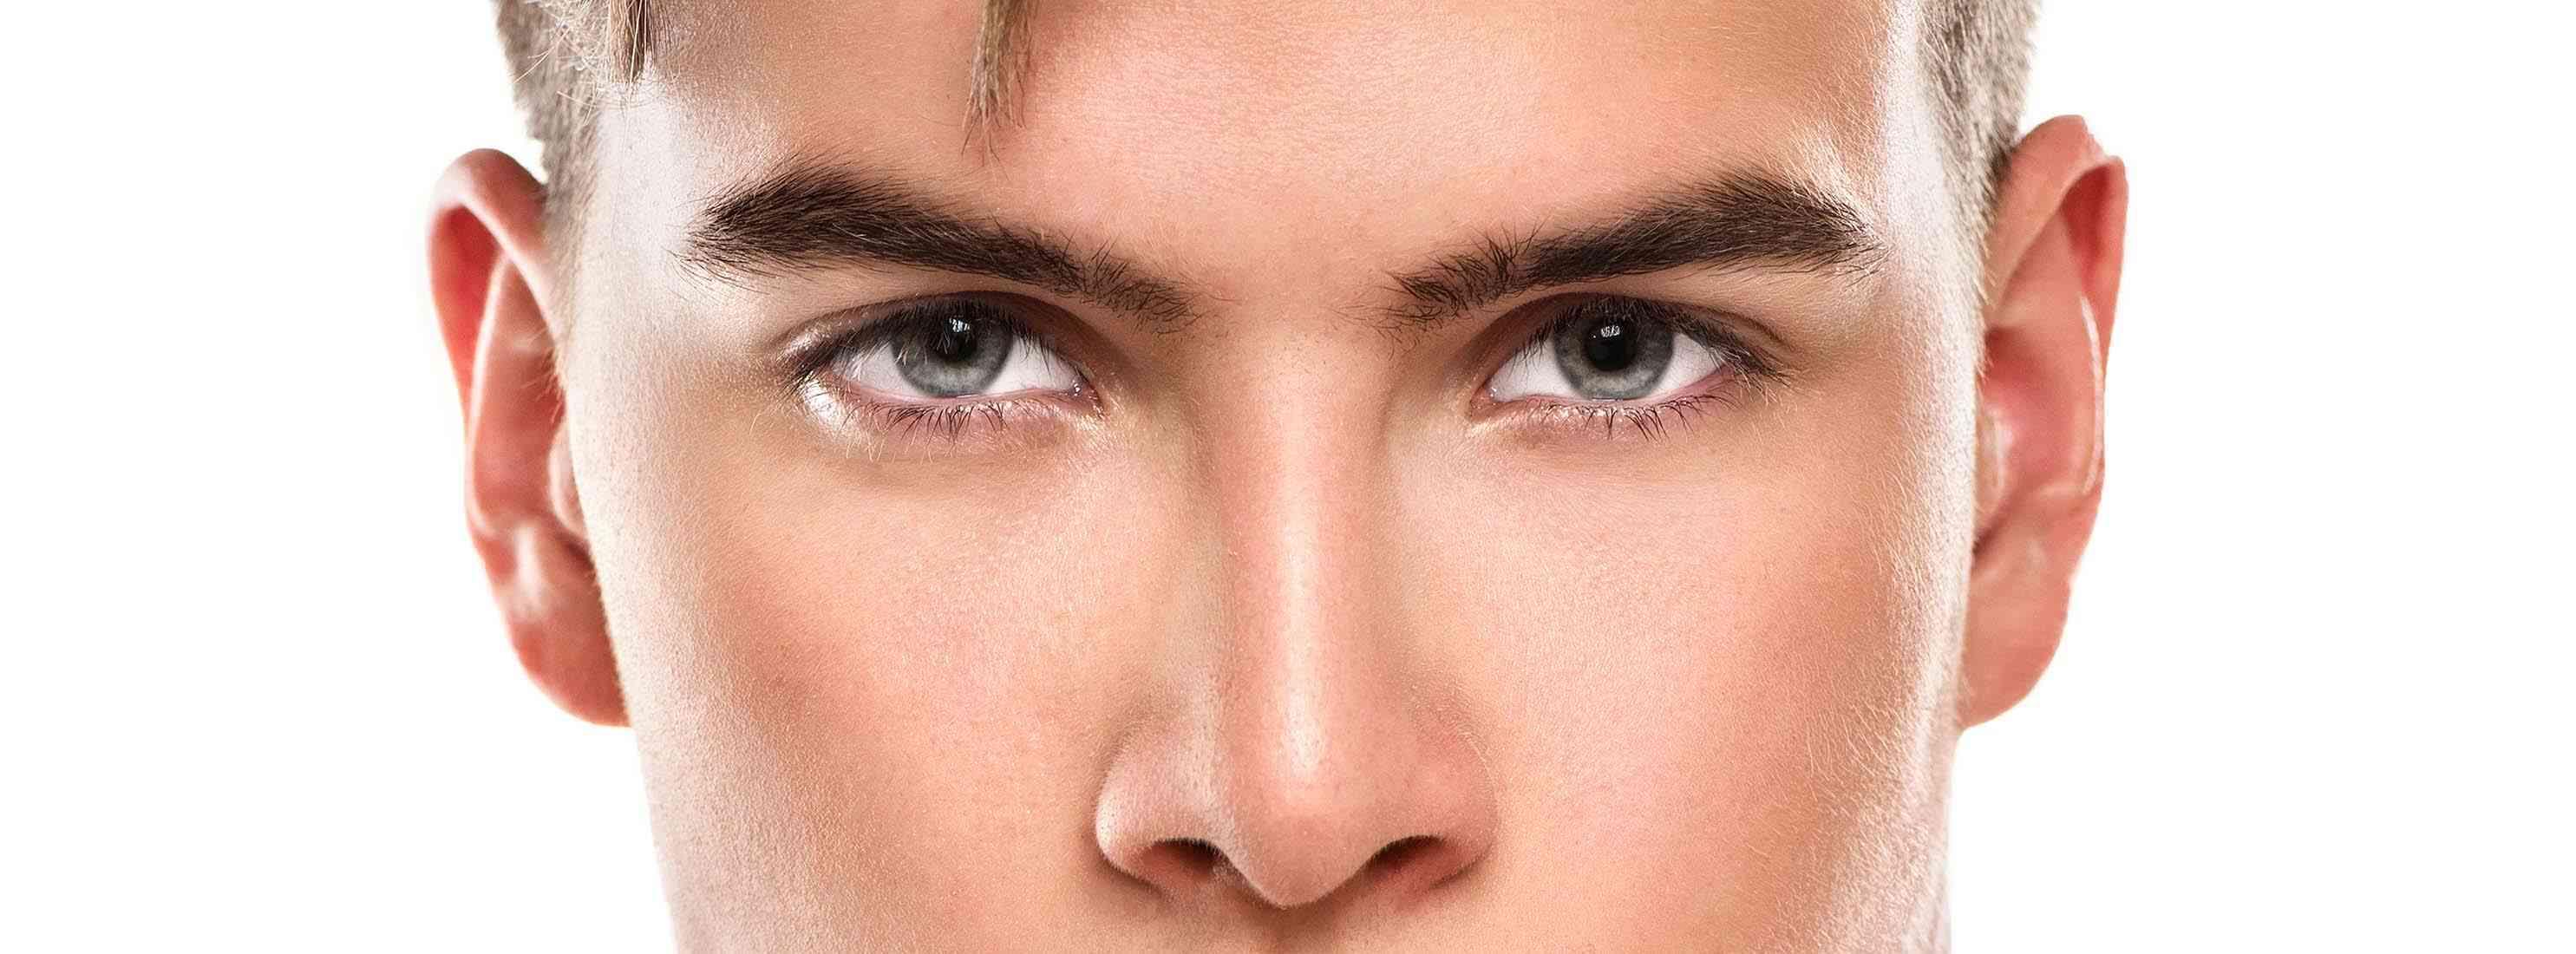 Freshkon Contact Lenses 03 2970x1100